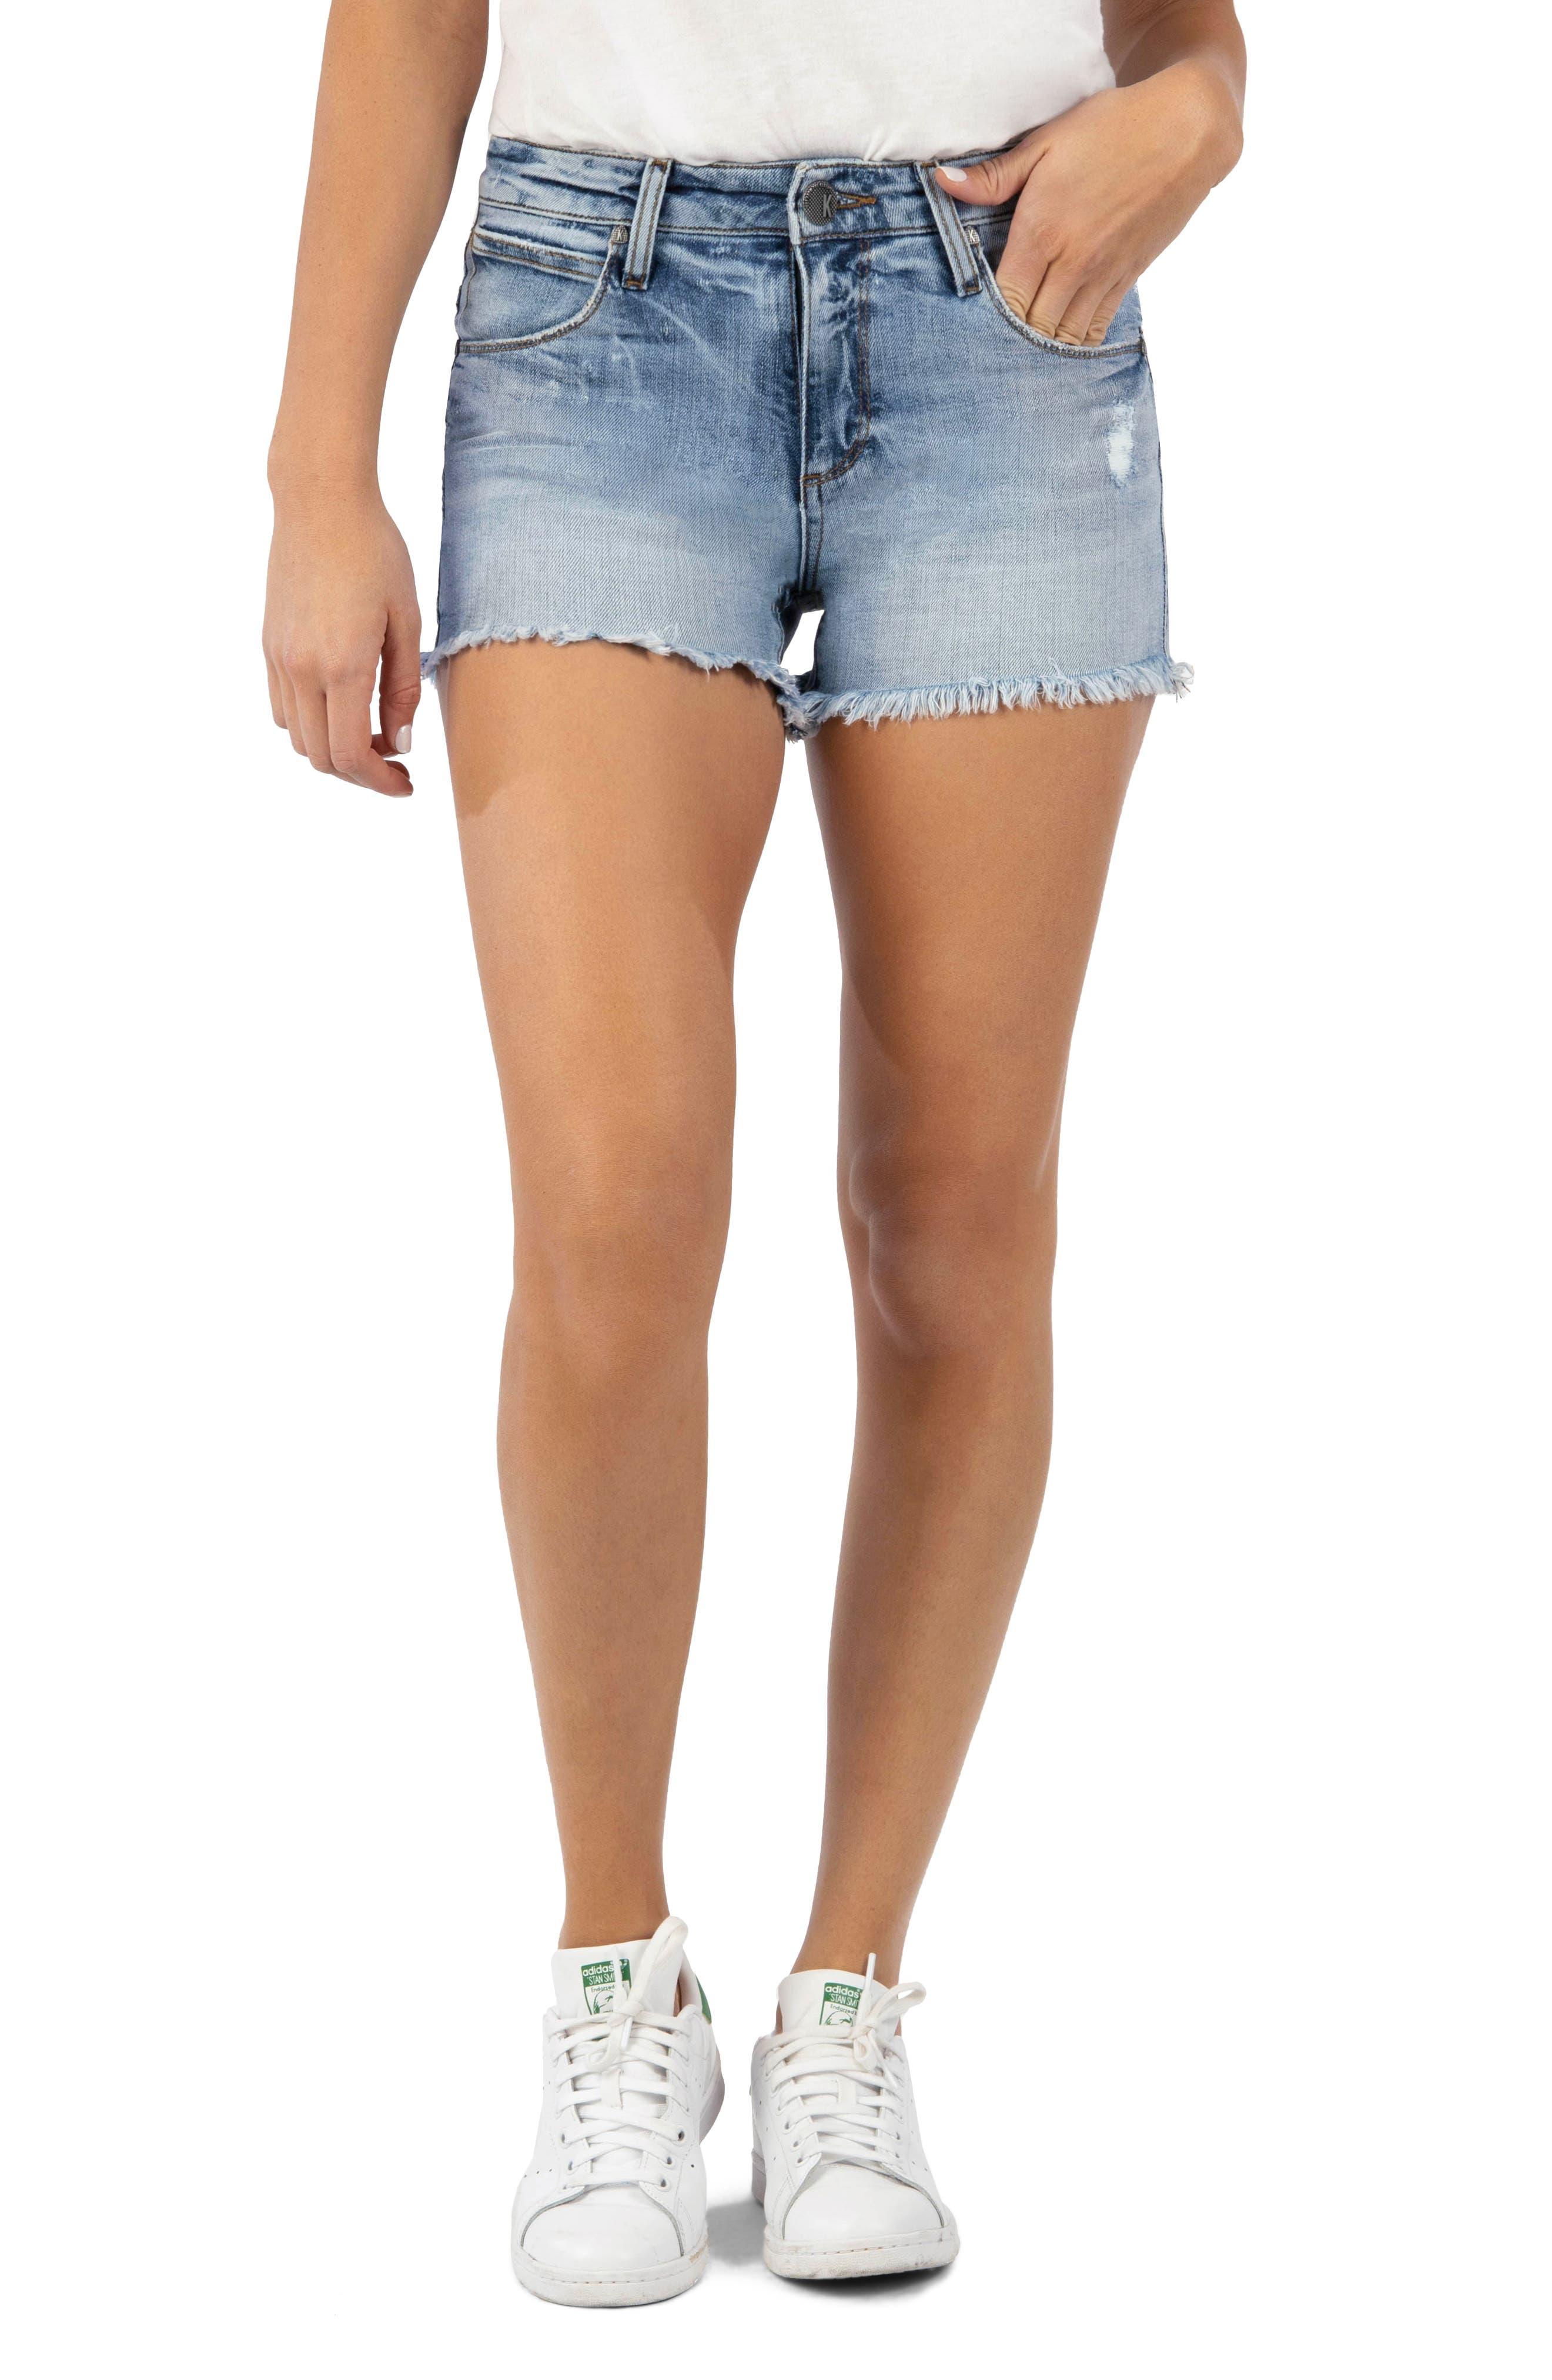 Gidget Distressed Denim Shorts